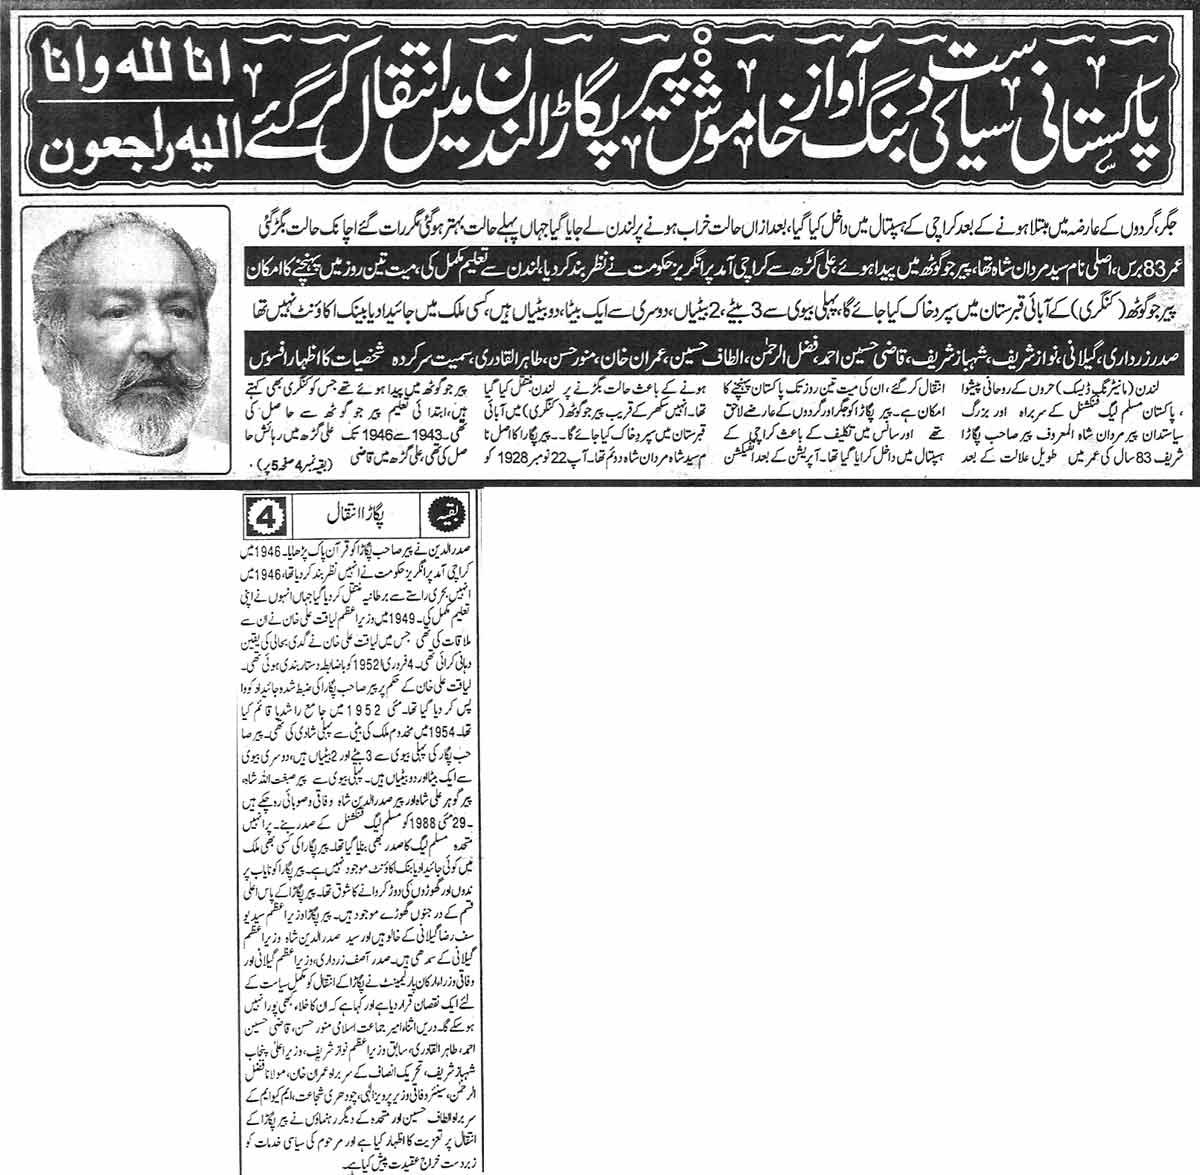 تحریک منہاج القرآن Minhaj-ul-Quran  Print Media Coverage پرنٹ میڈیا کوریج Daily Pakistan Page 1